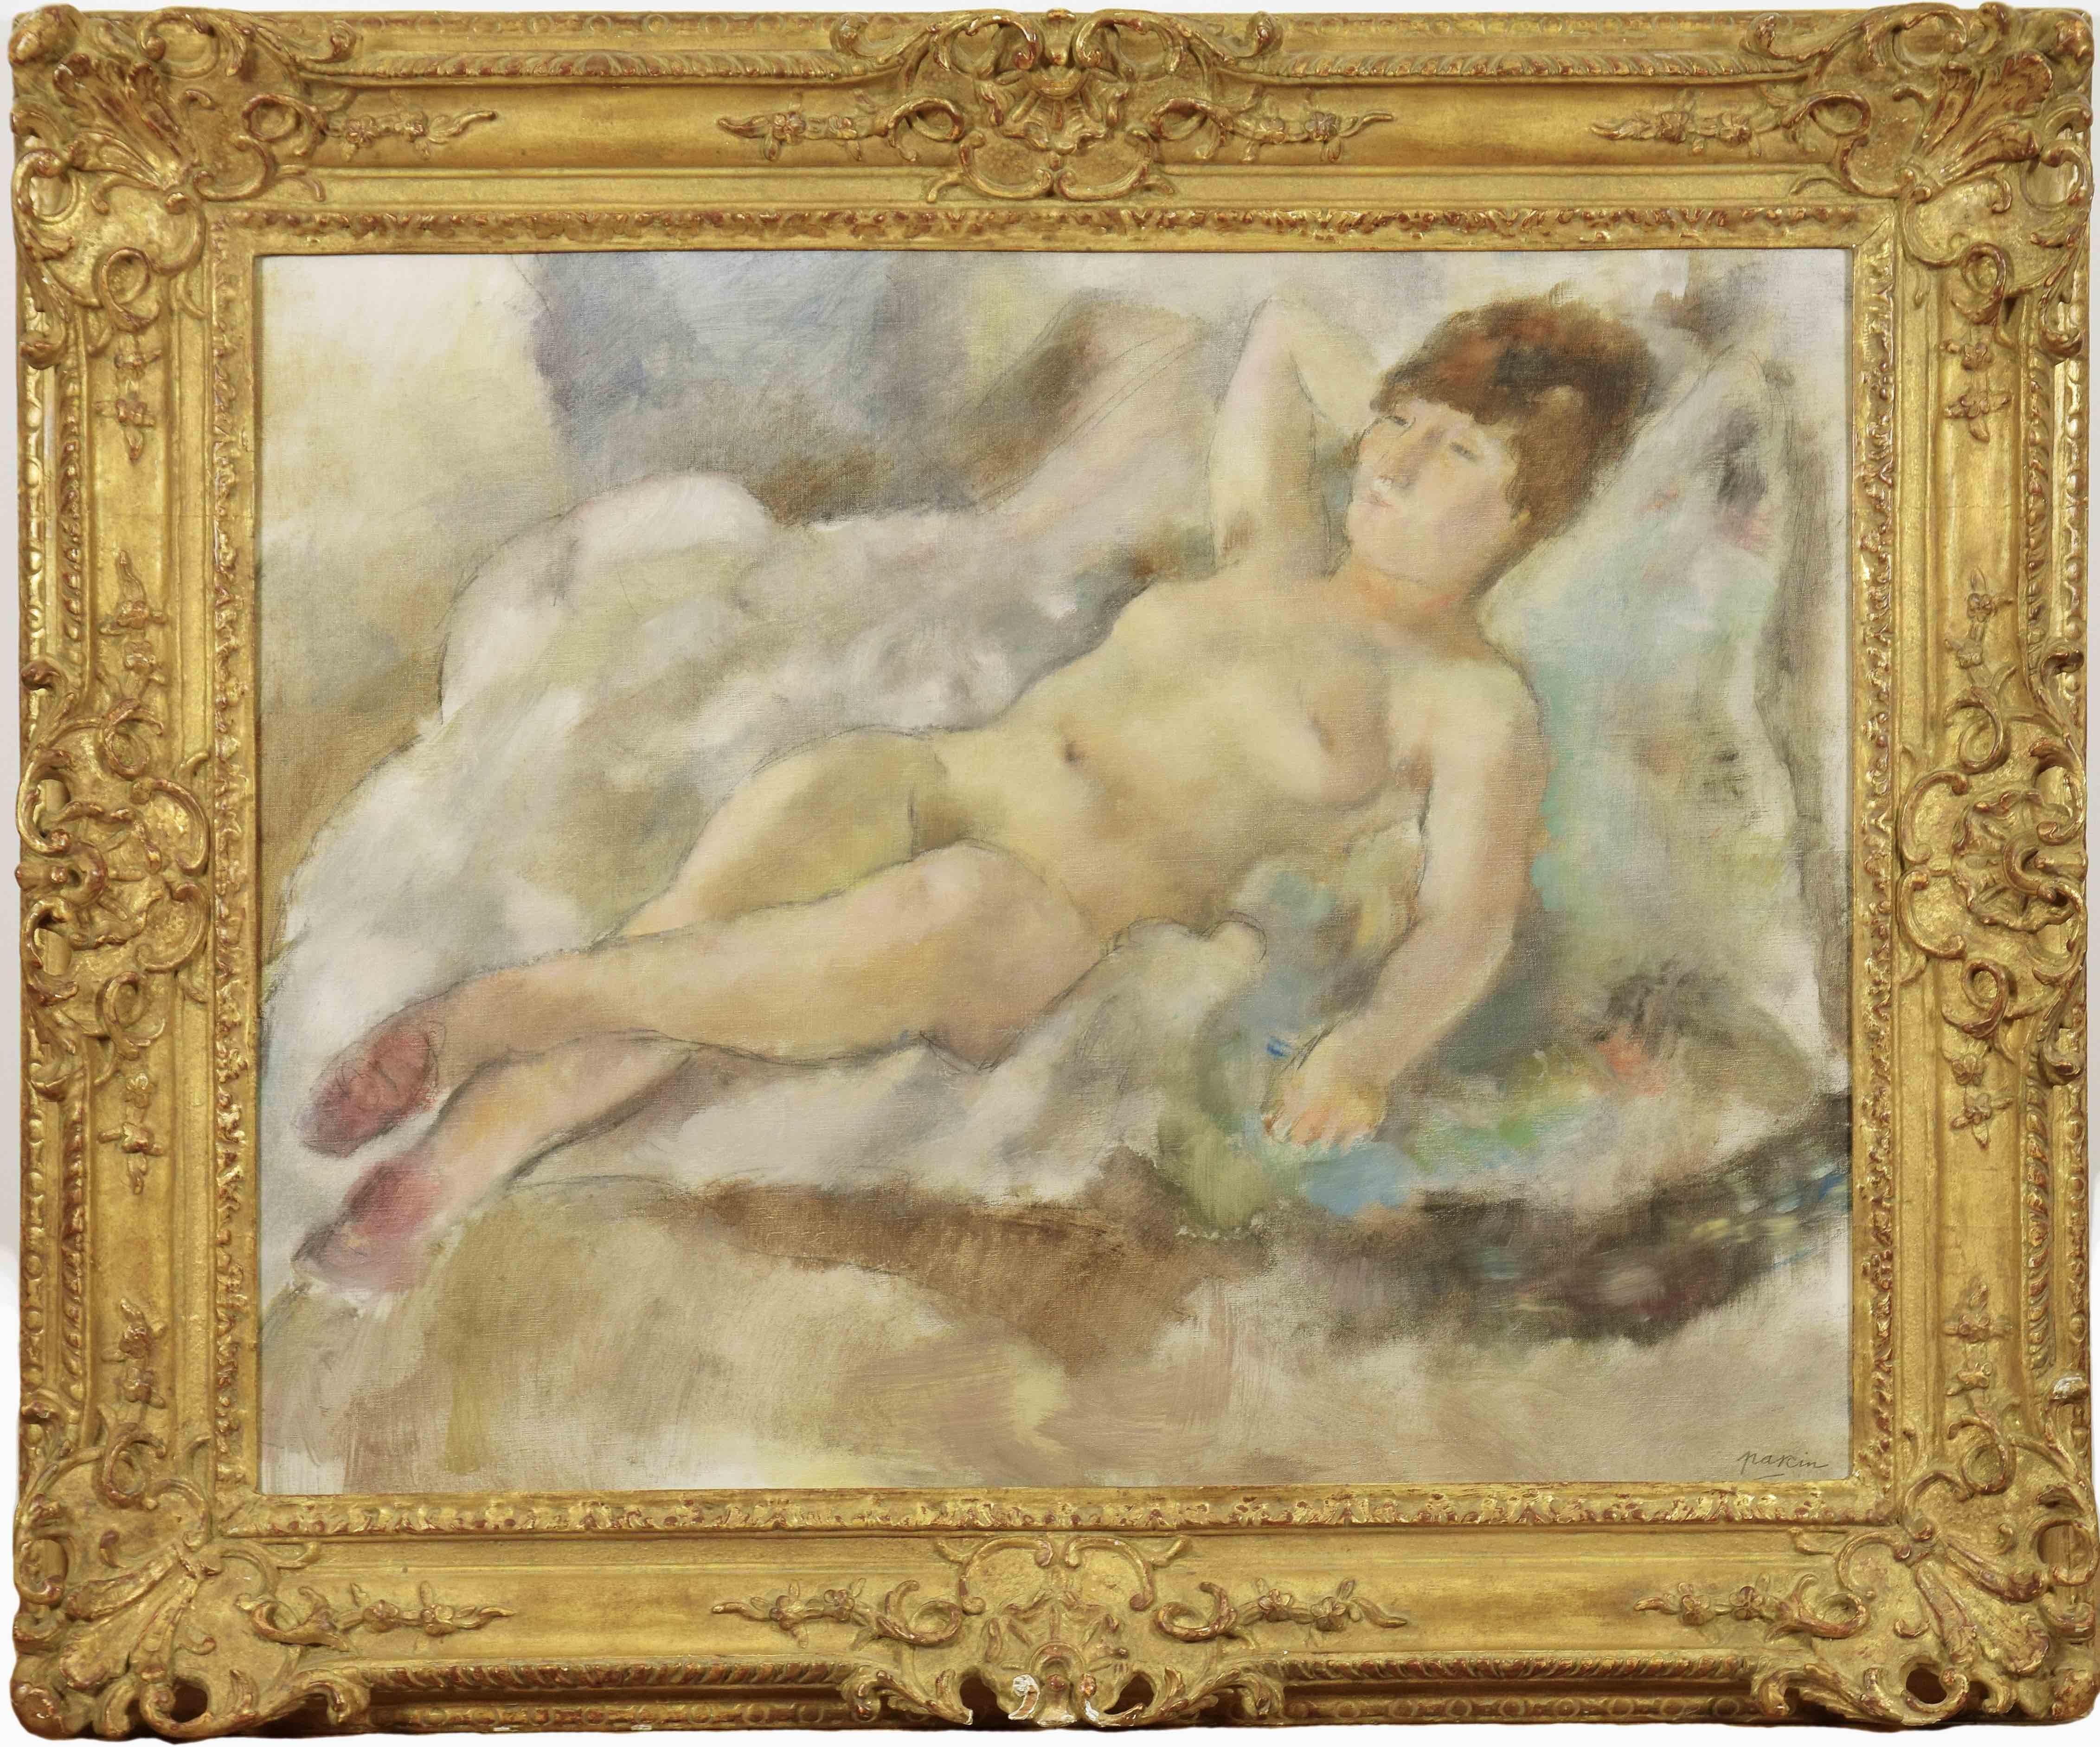 Rebecca Couchée by JULES PASCIN - School of Paris, Nude Painting, Figurative Art